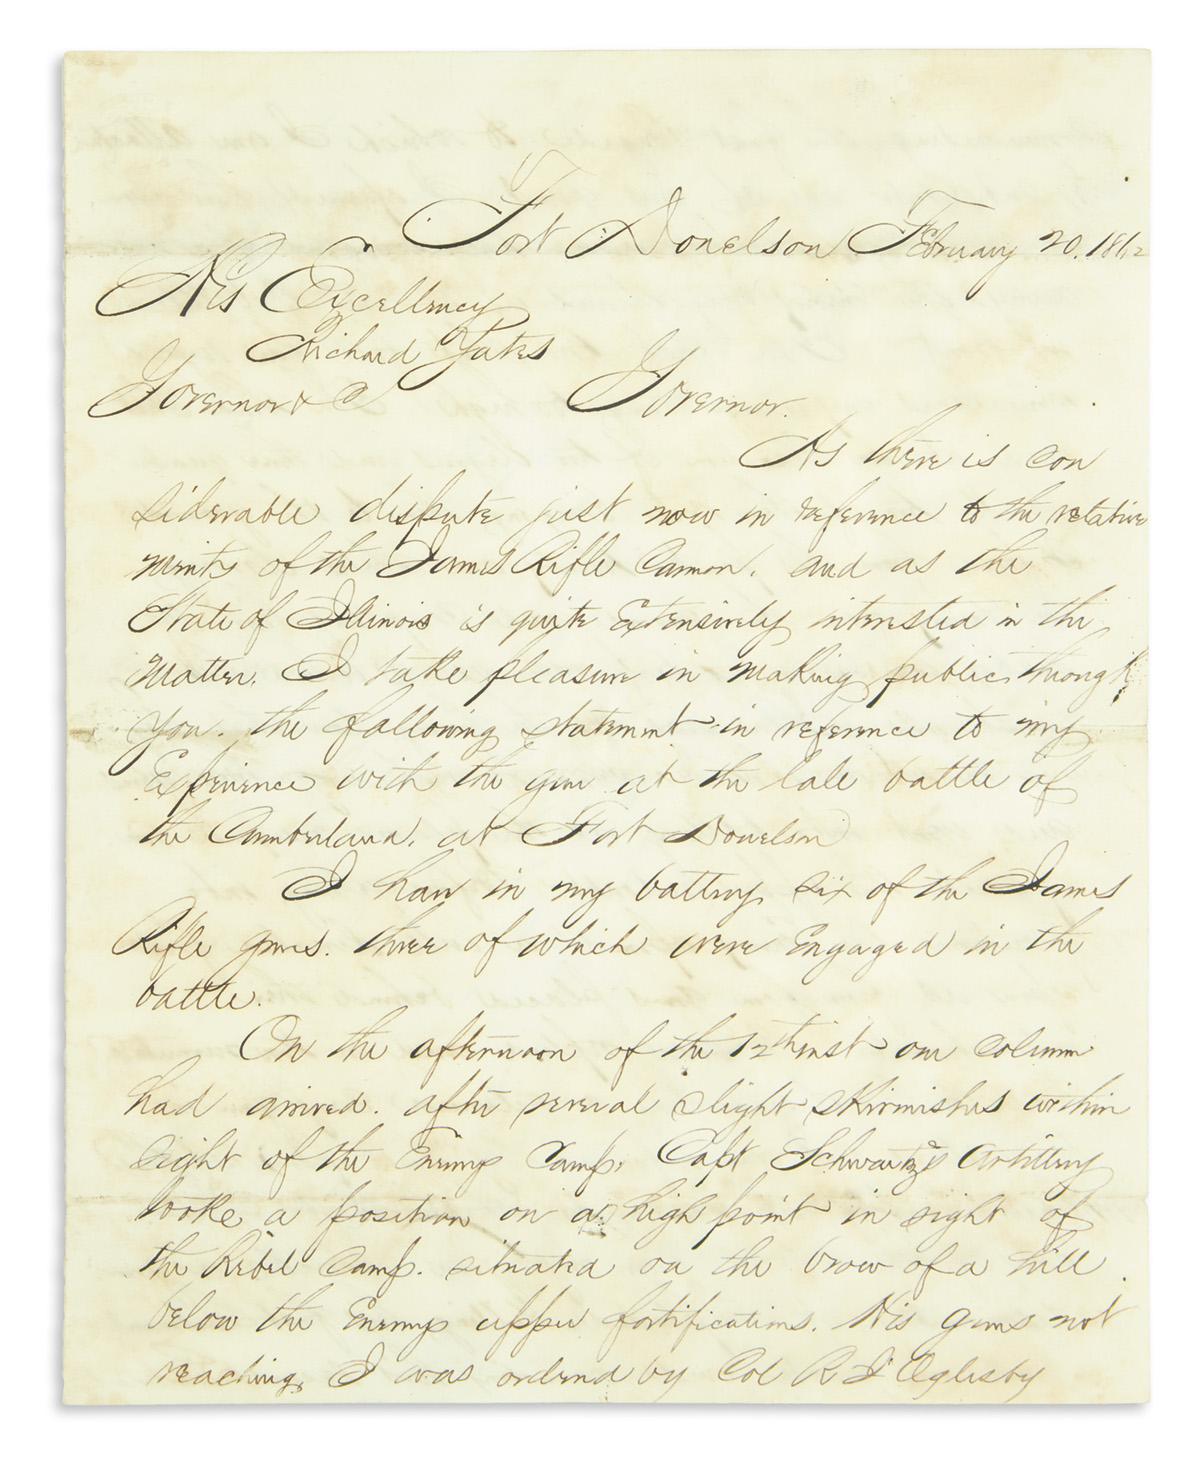 (CIVIL-WAR)-Dresser-Jasper-M-Artillerymans-letter-providing-